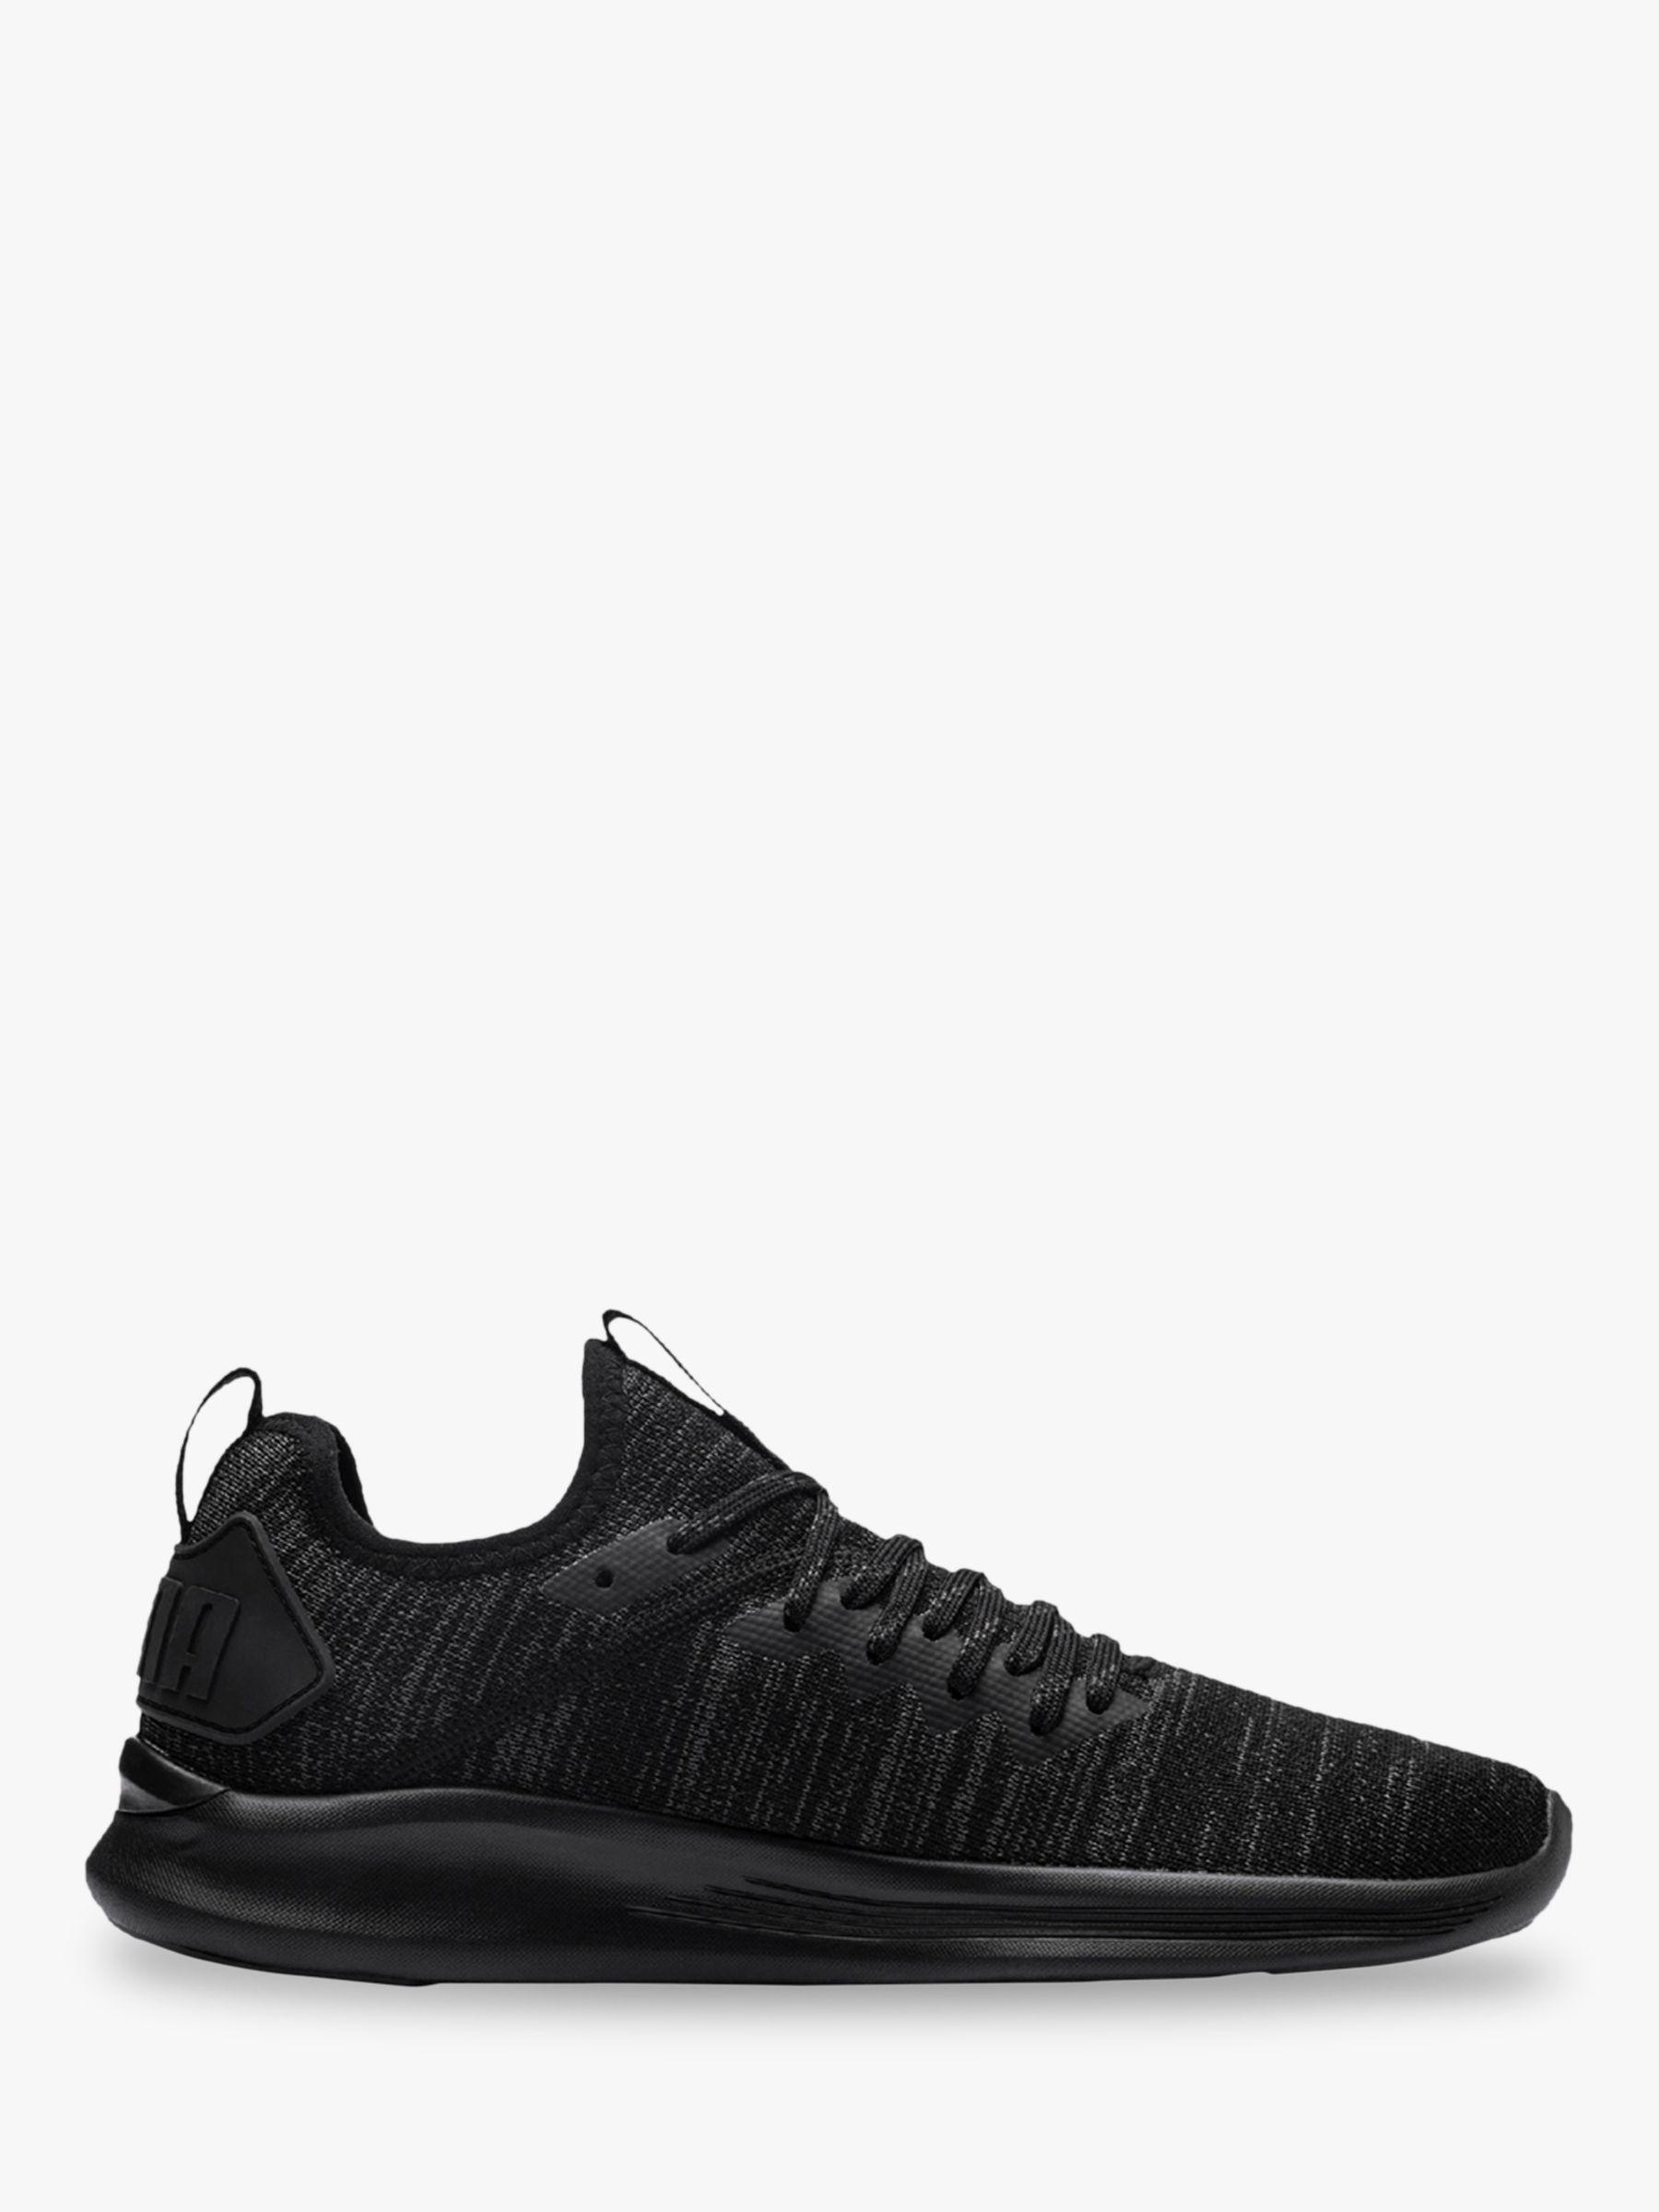 huge discount f4048 c70be PUMA Ignite Flash evoKNIT Women's Running Shoes, PUMA Black ...